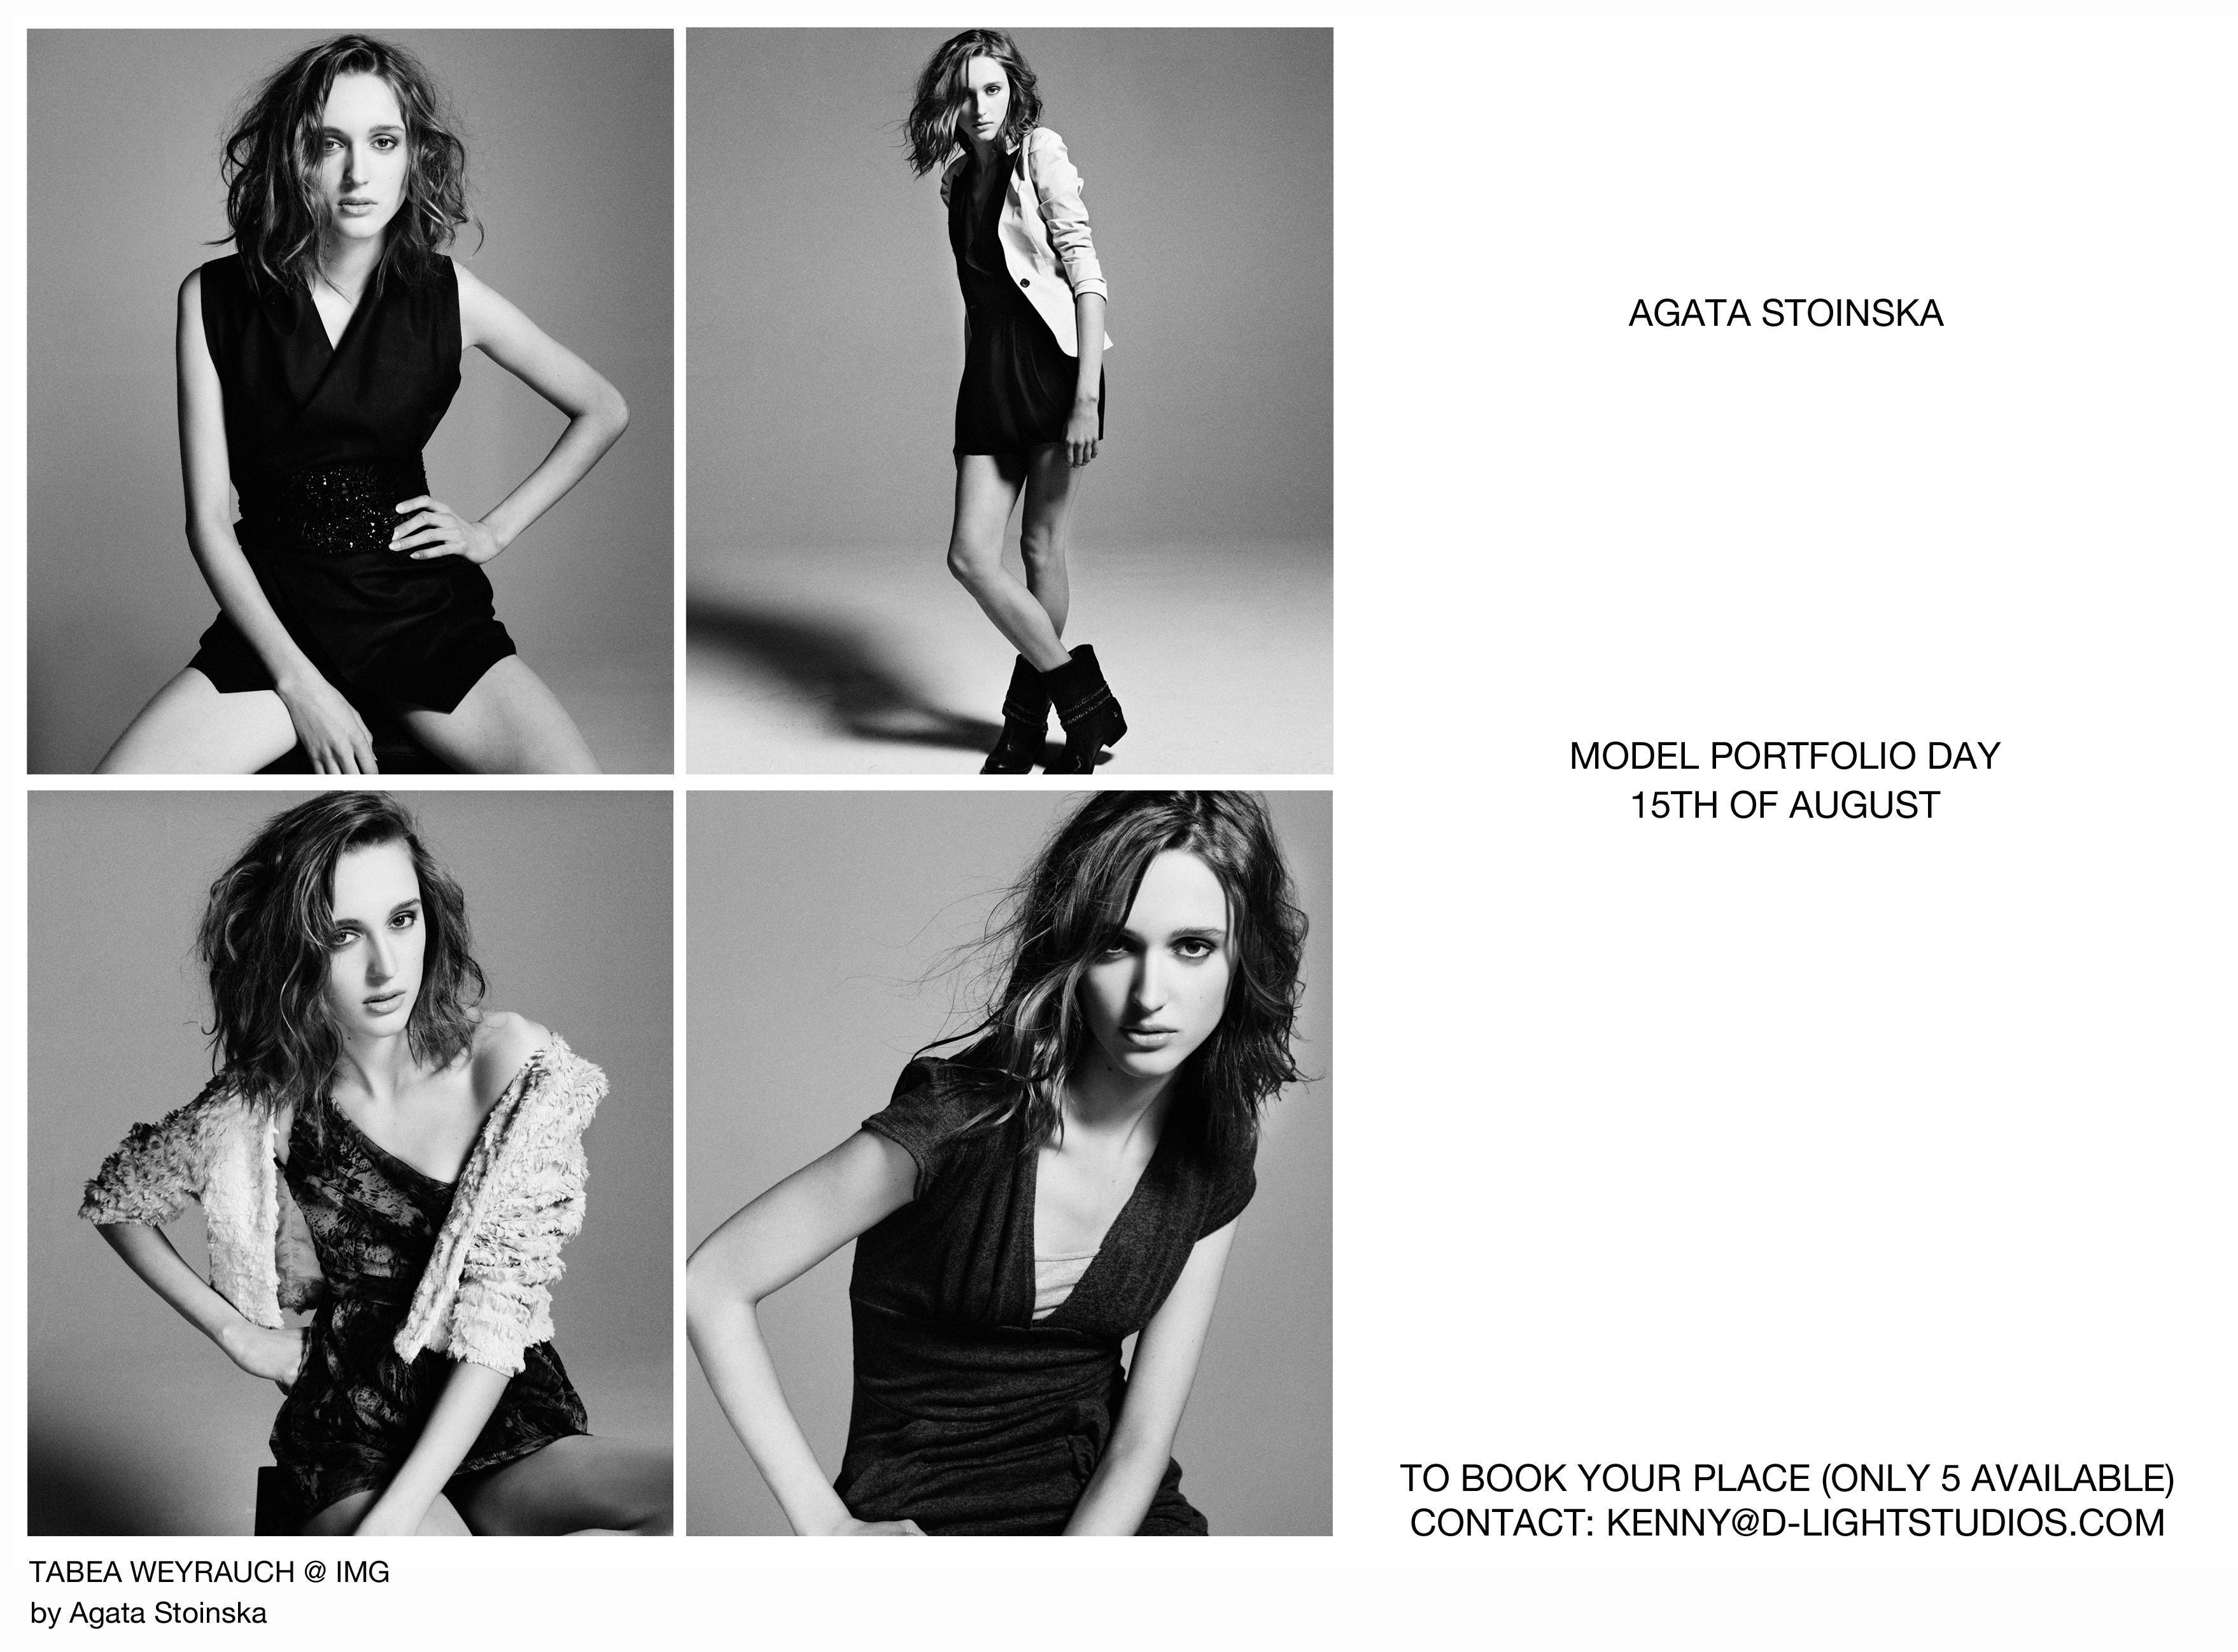 Model Portfolio day, 15th of August!! | Dlightstudios's Blog